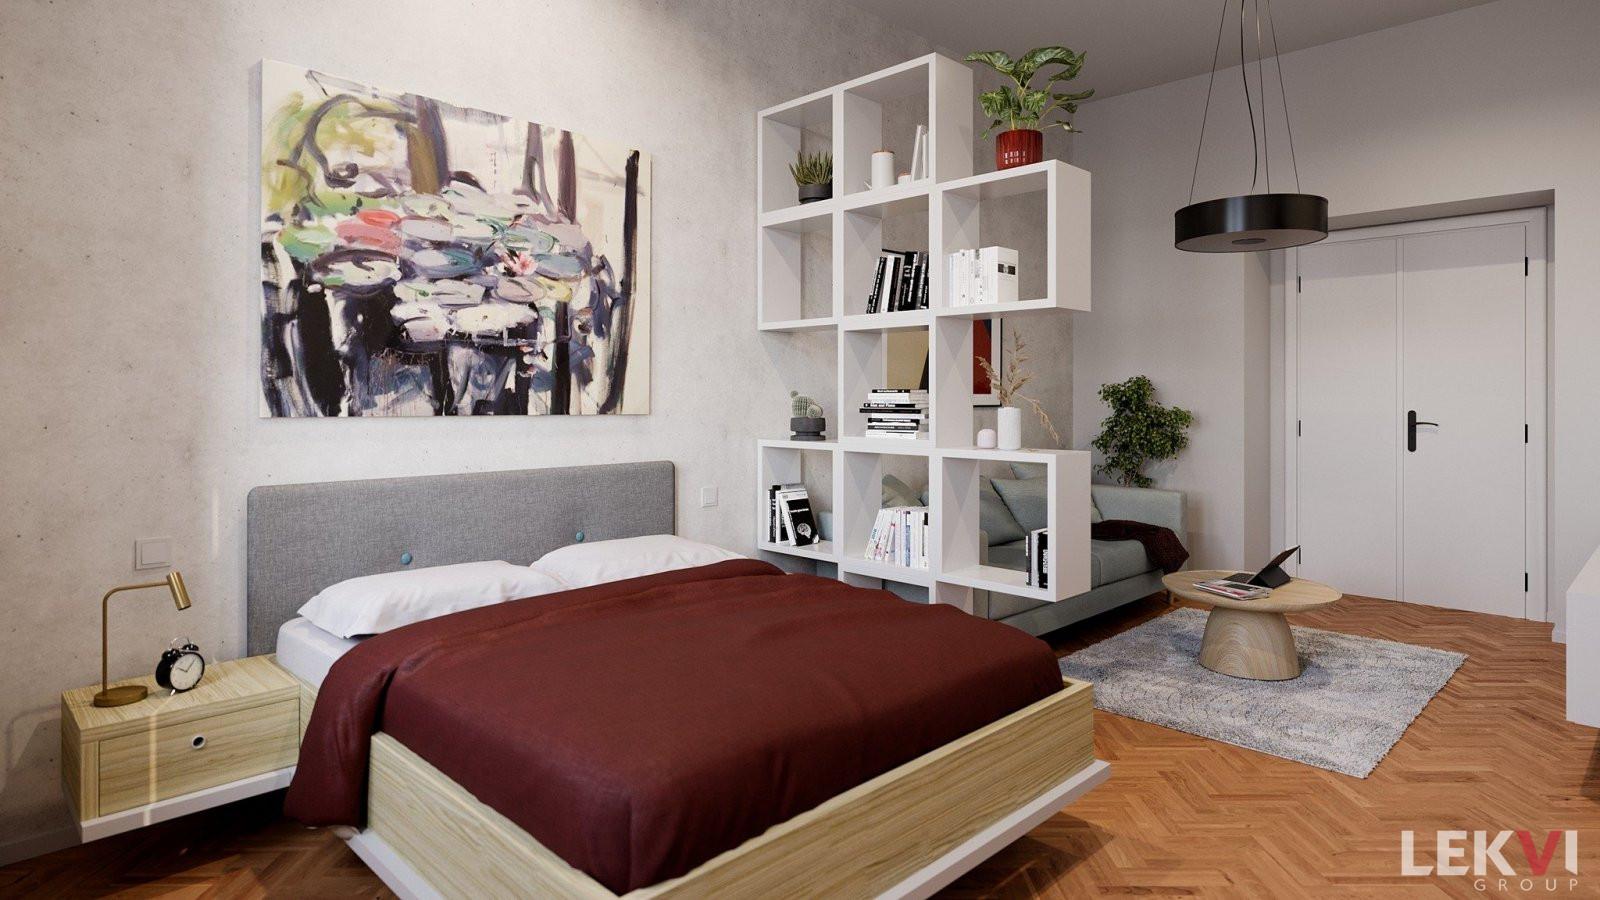 Prodej bytu 2+1, 73 m2 - Sokolovská, Praha 8